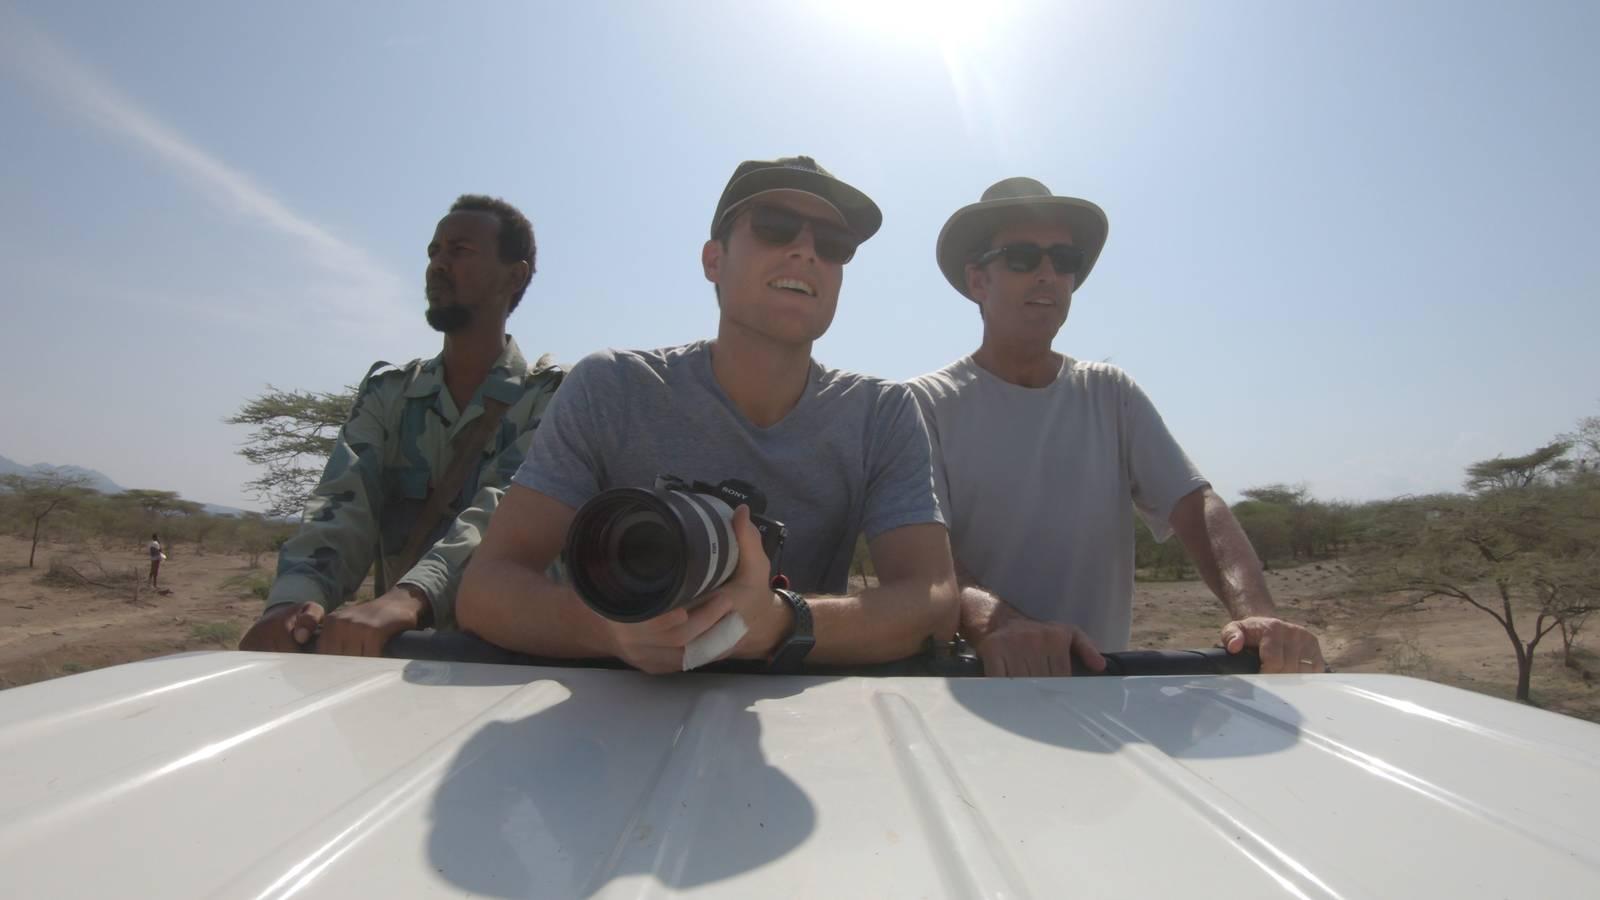 Turisti Curiosi con Bob e Mack Woodruff 1